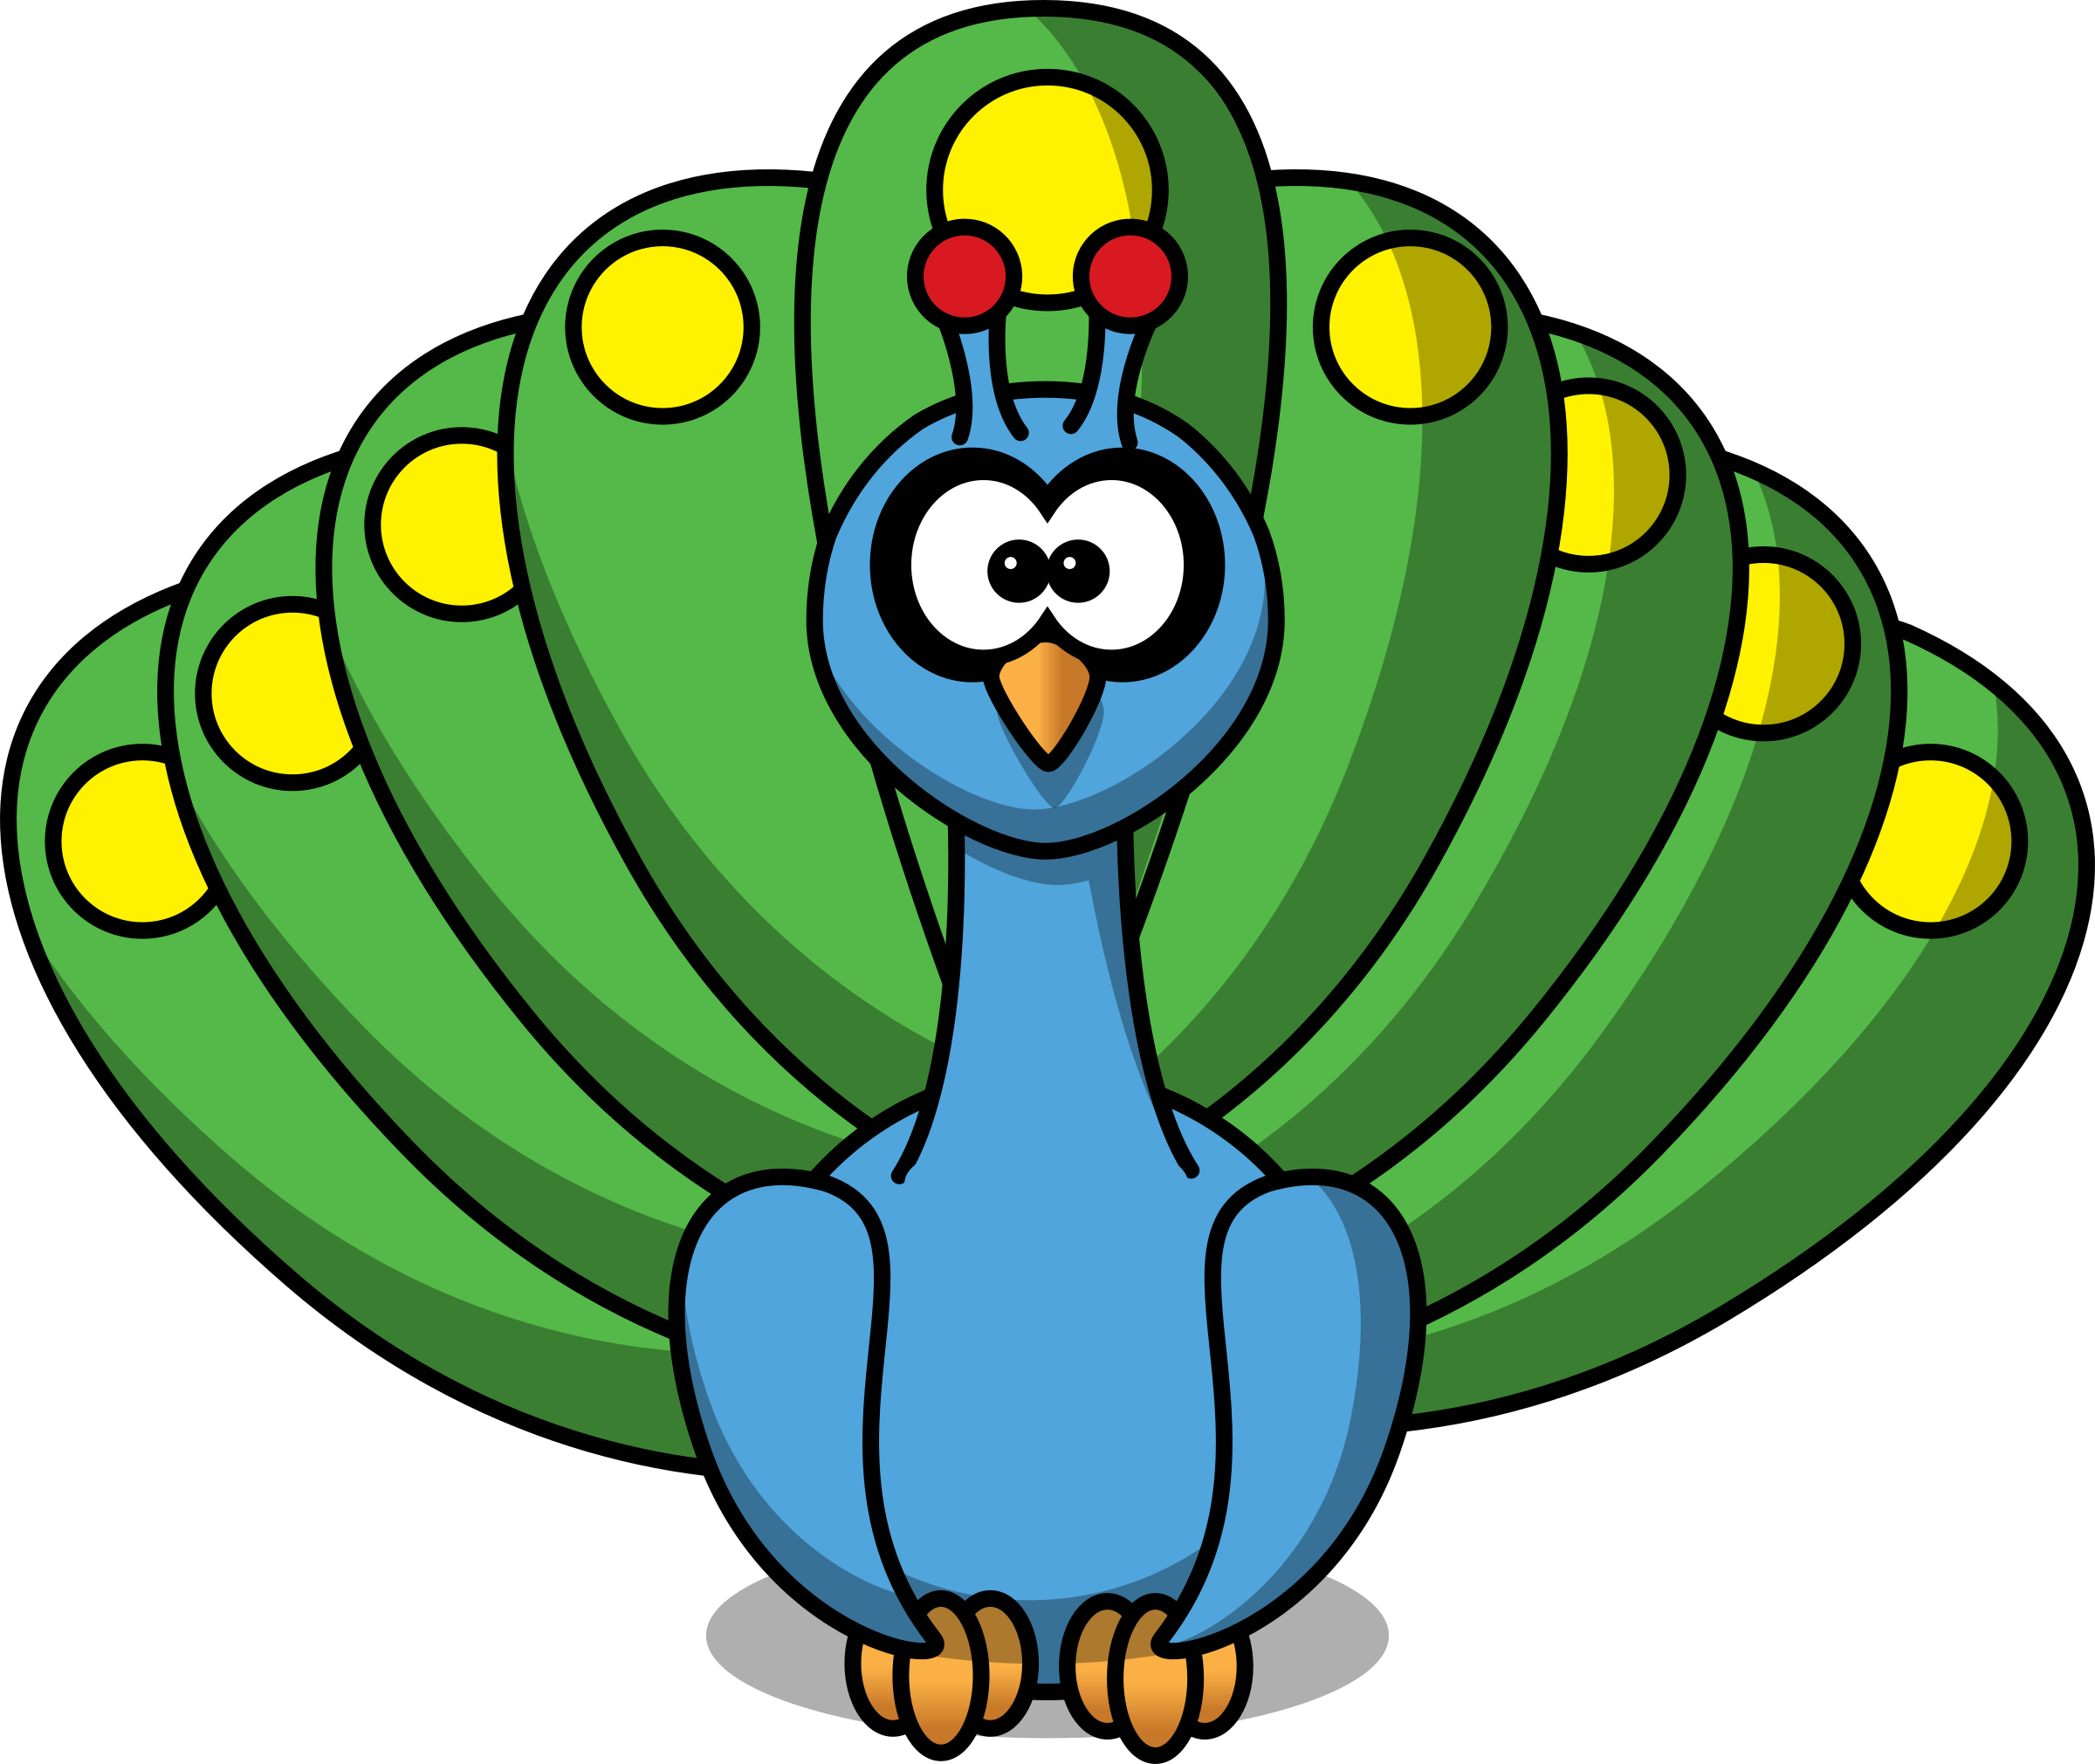 Cute clipart march. Cartoon peacock by studiofibonacci